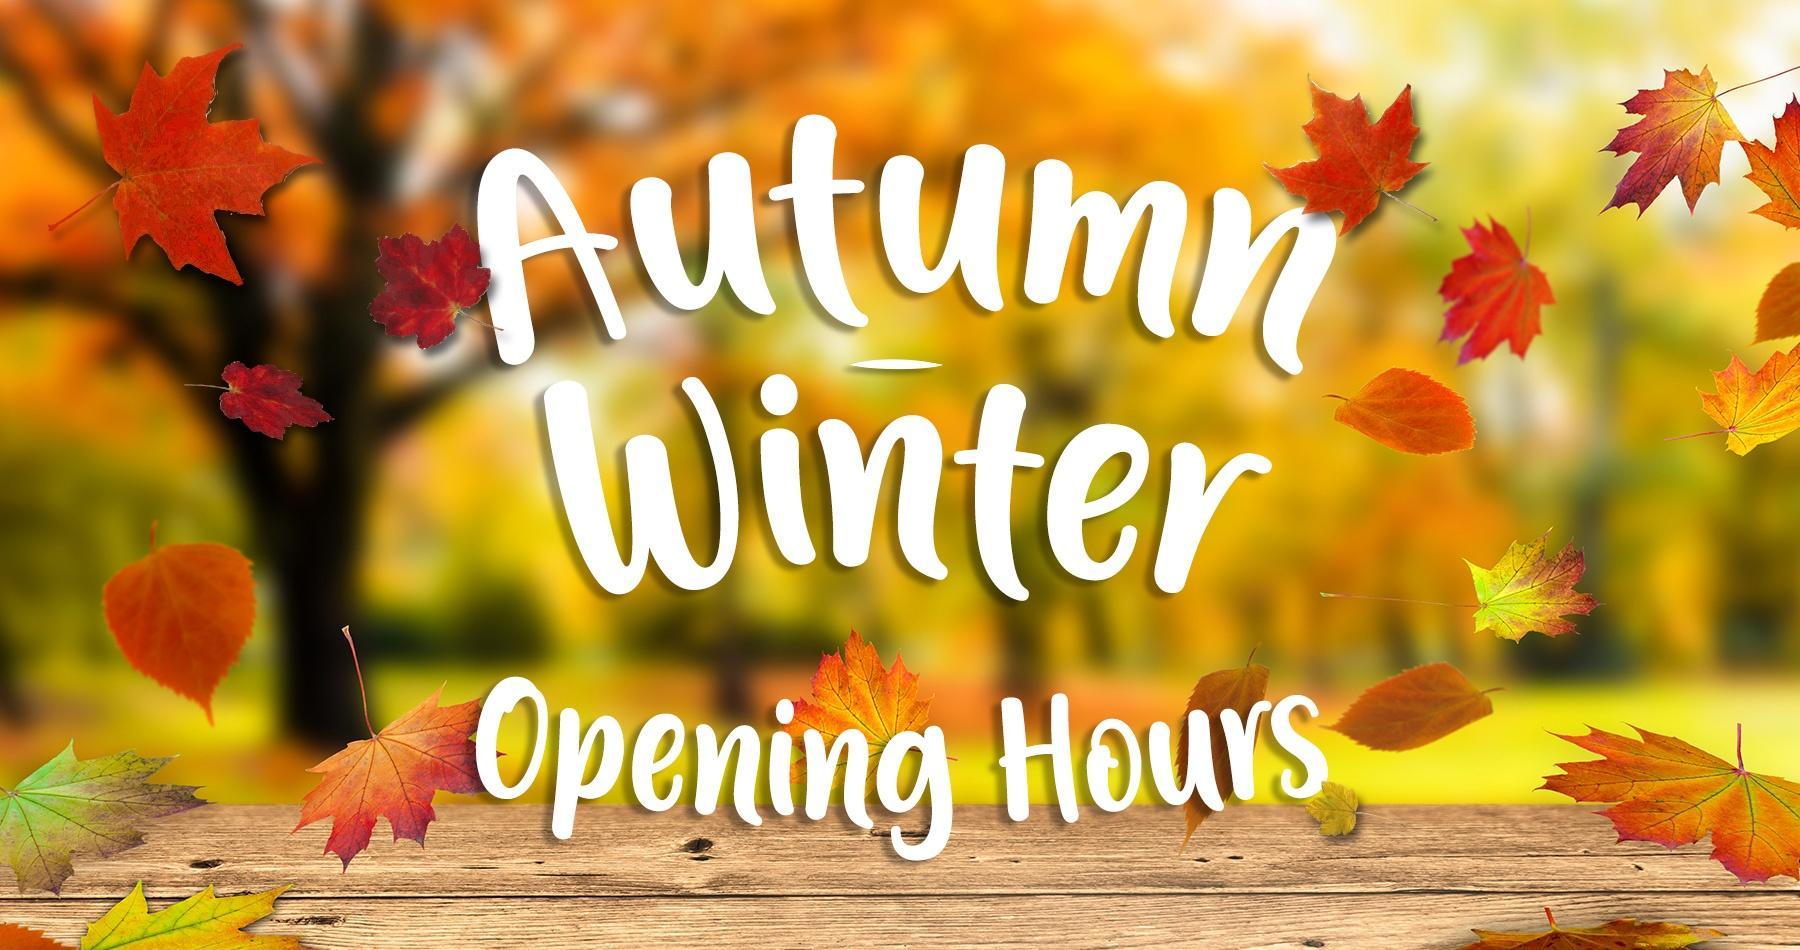 Autumn Winter Open Hours